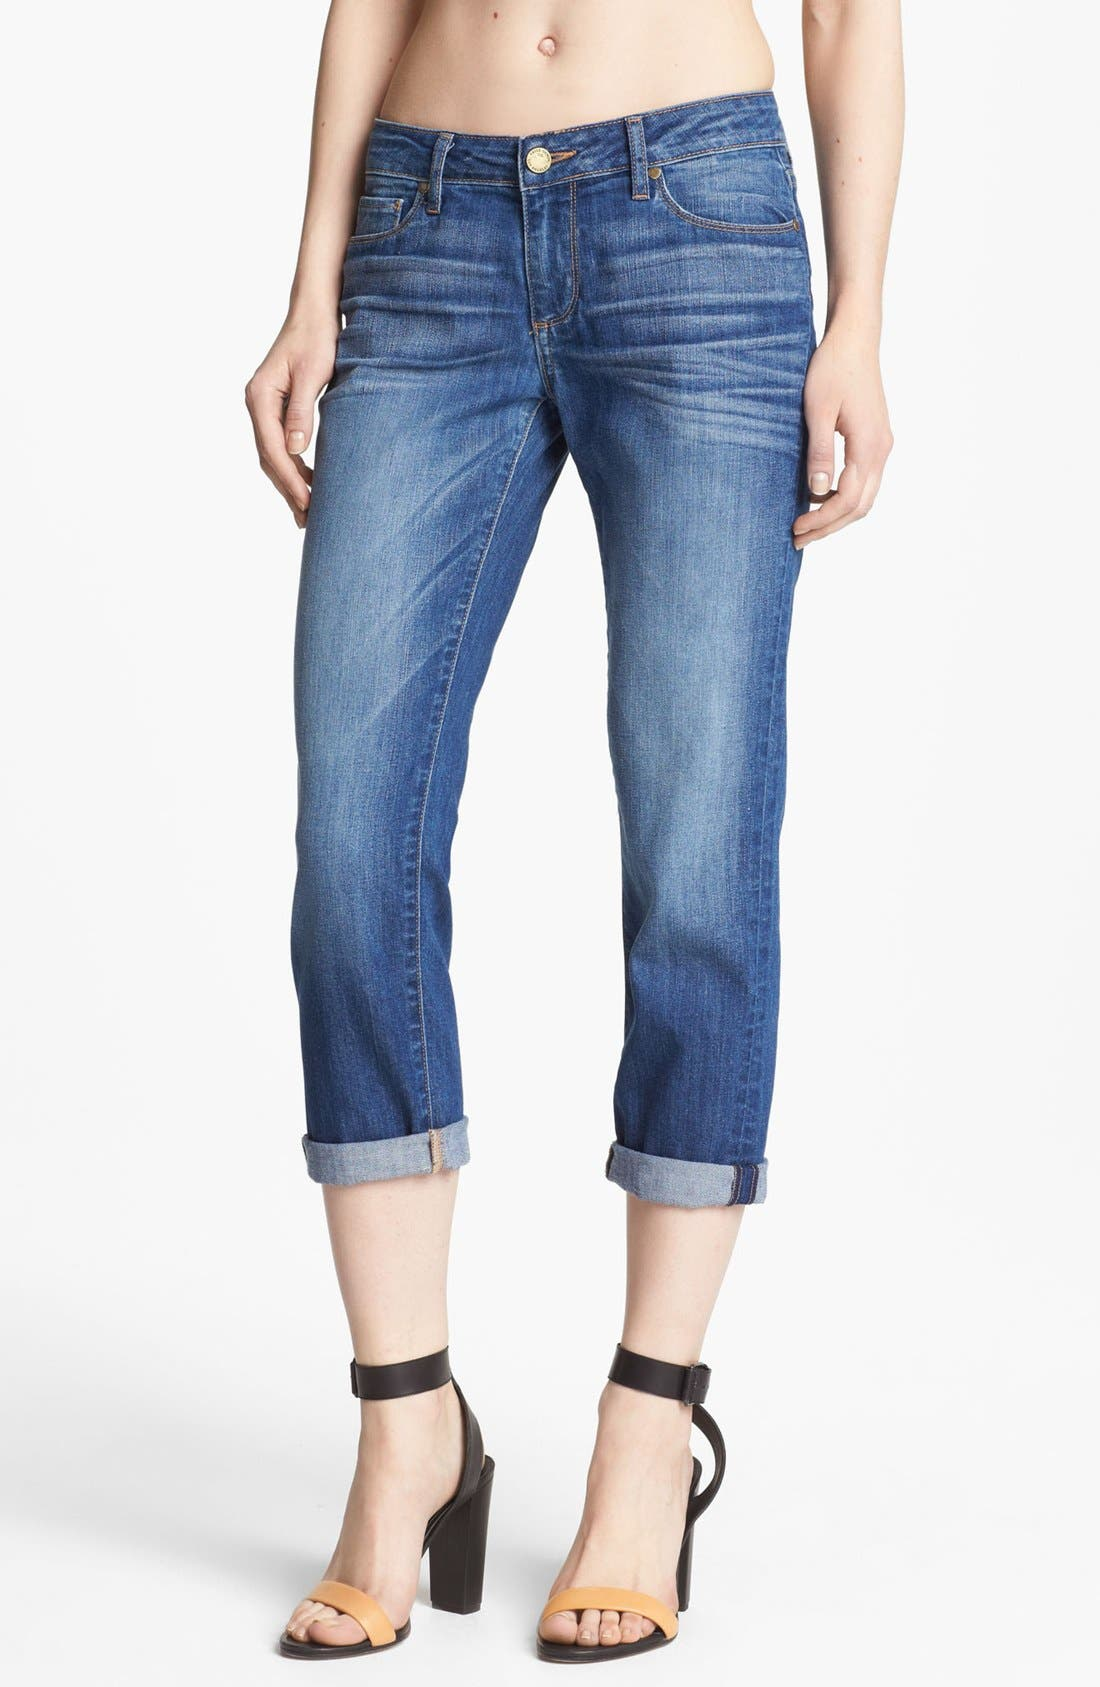 Alternate Image 1 Selected - Paige Denim 'James' Crop Jeans (Aero)